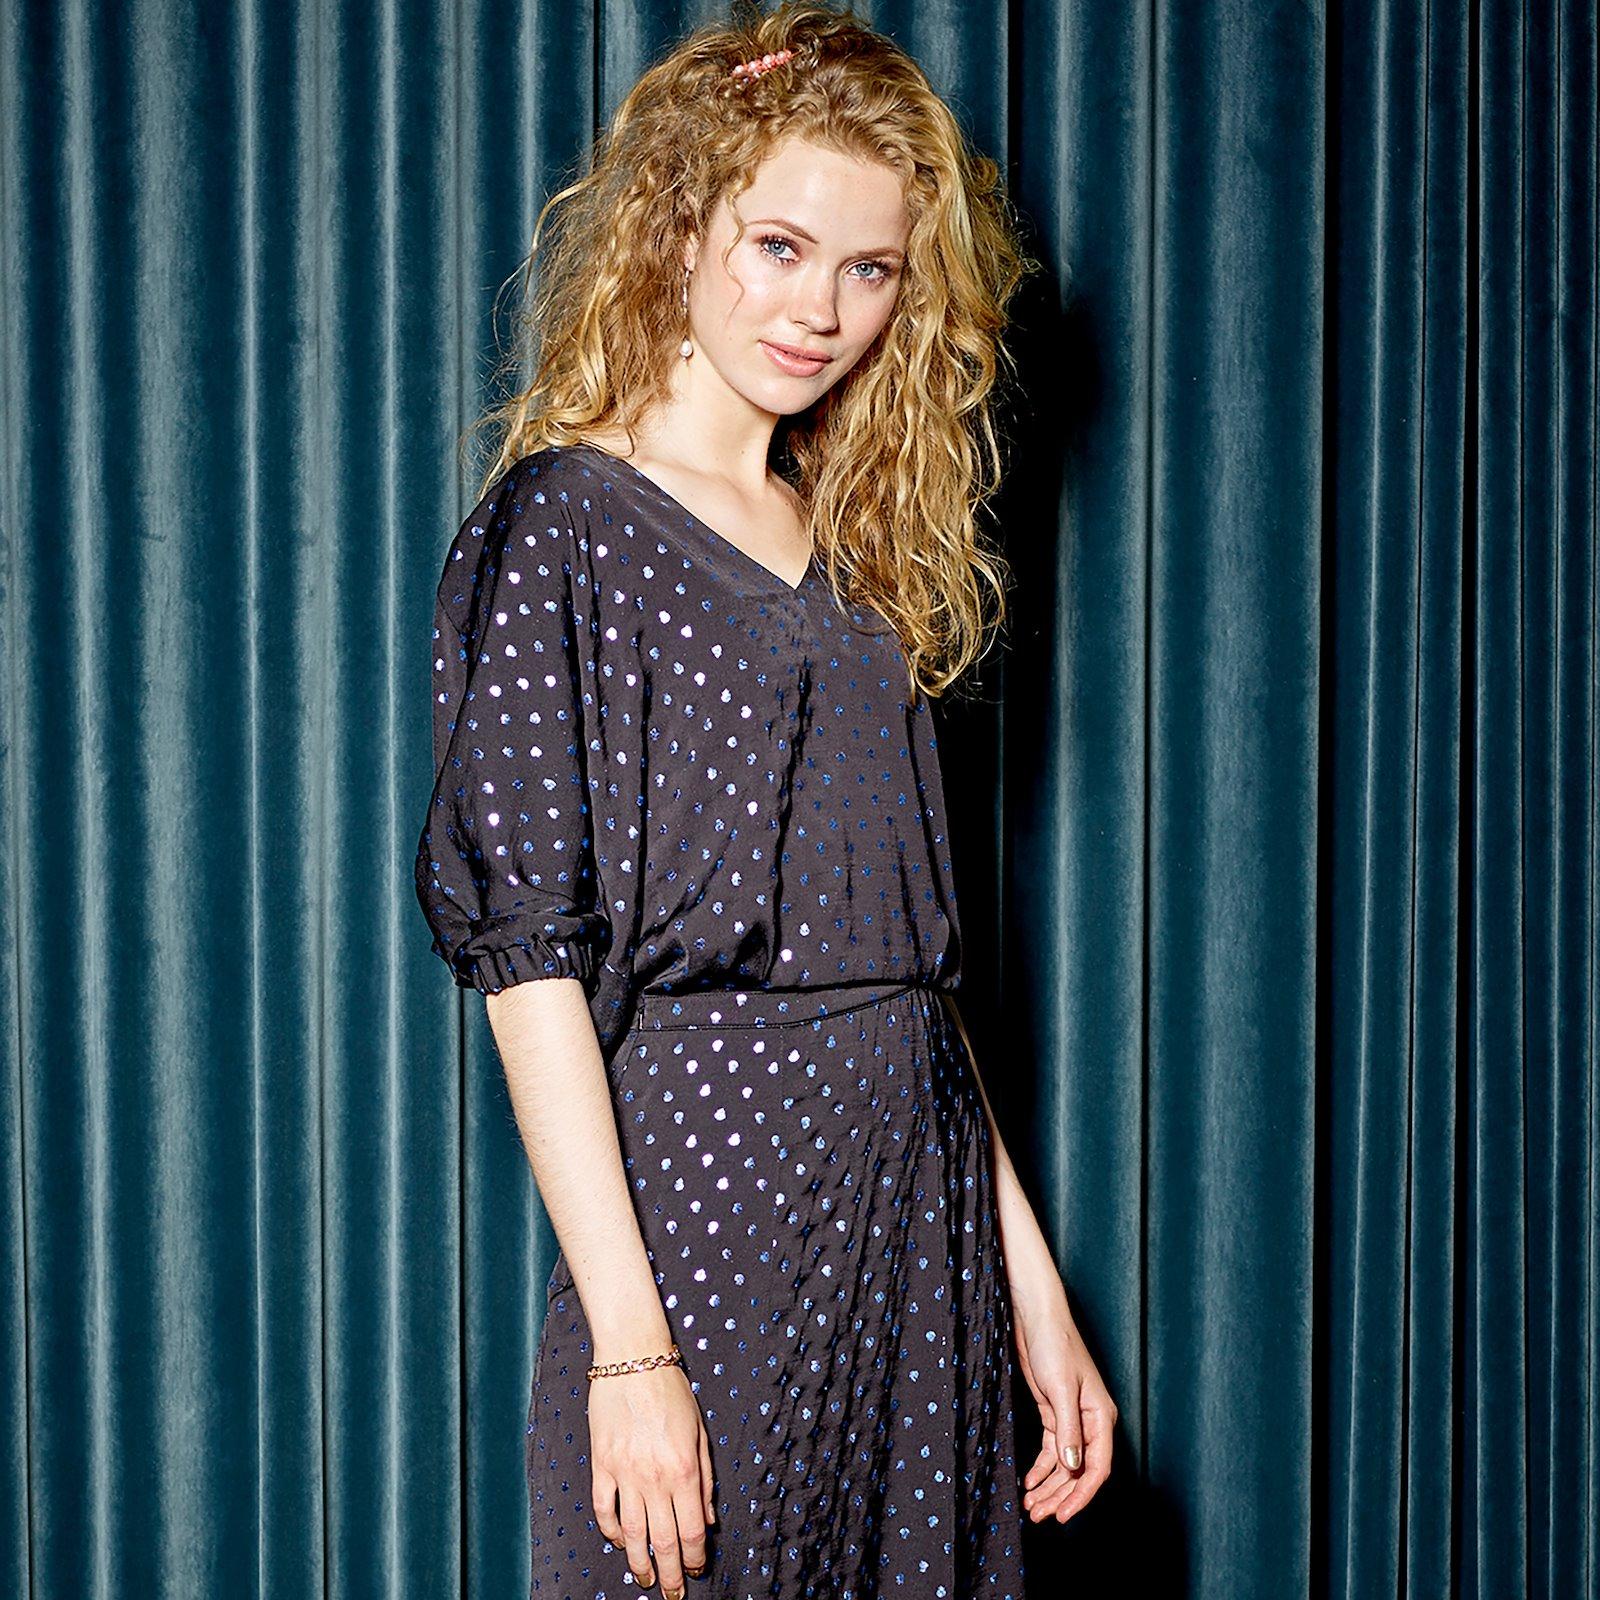 Wide dress with V-neck, 44/16 p23153_570100_sskit